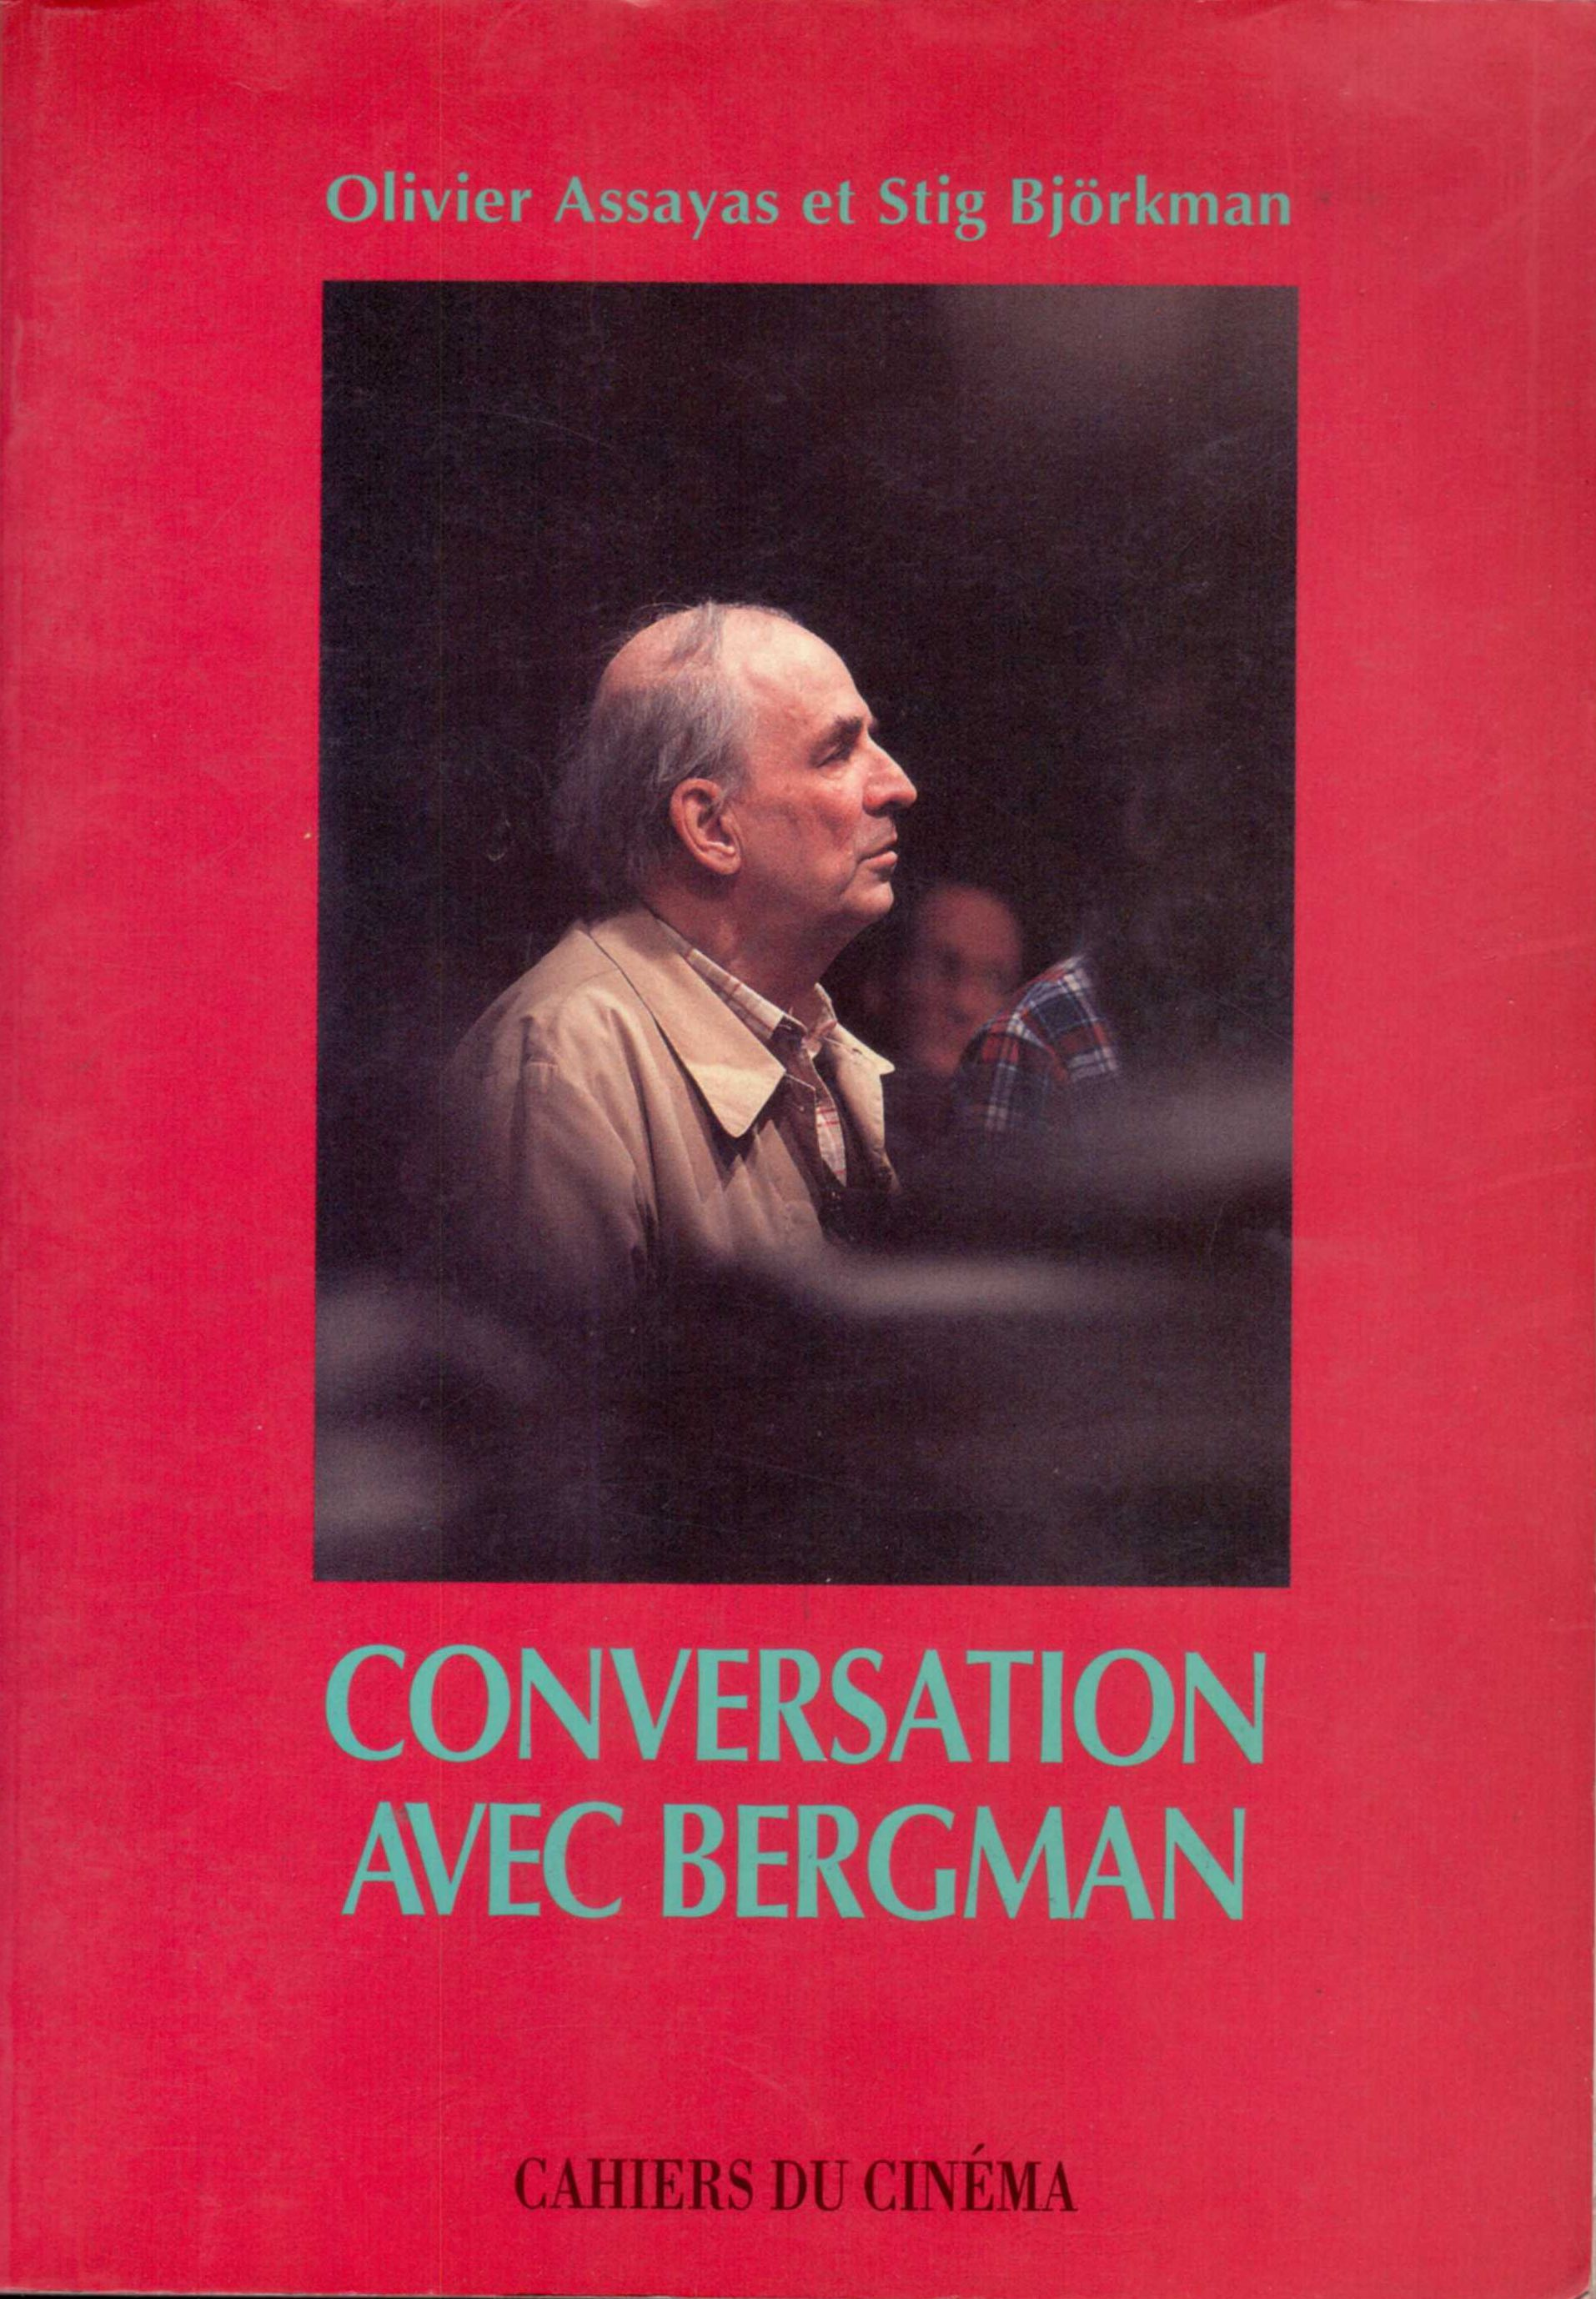 Conversation avec Bergman